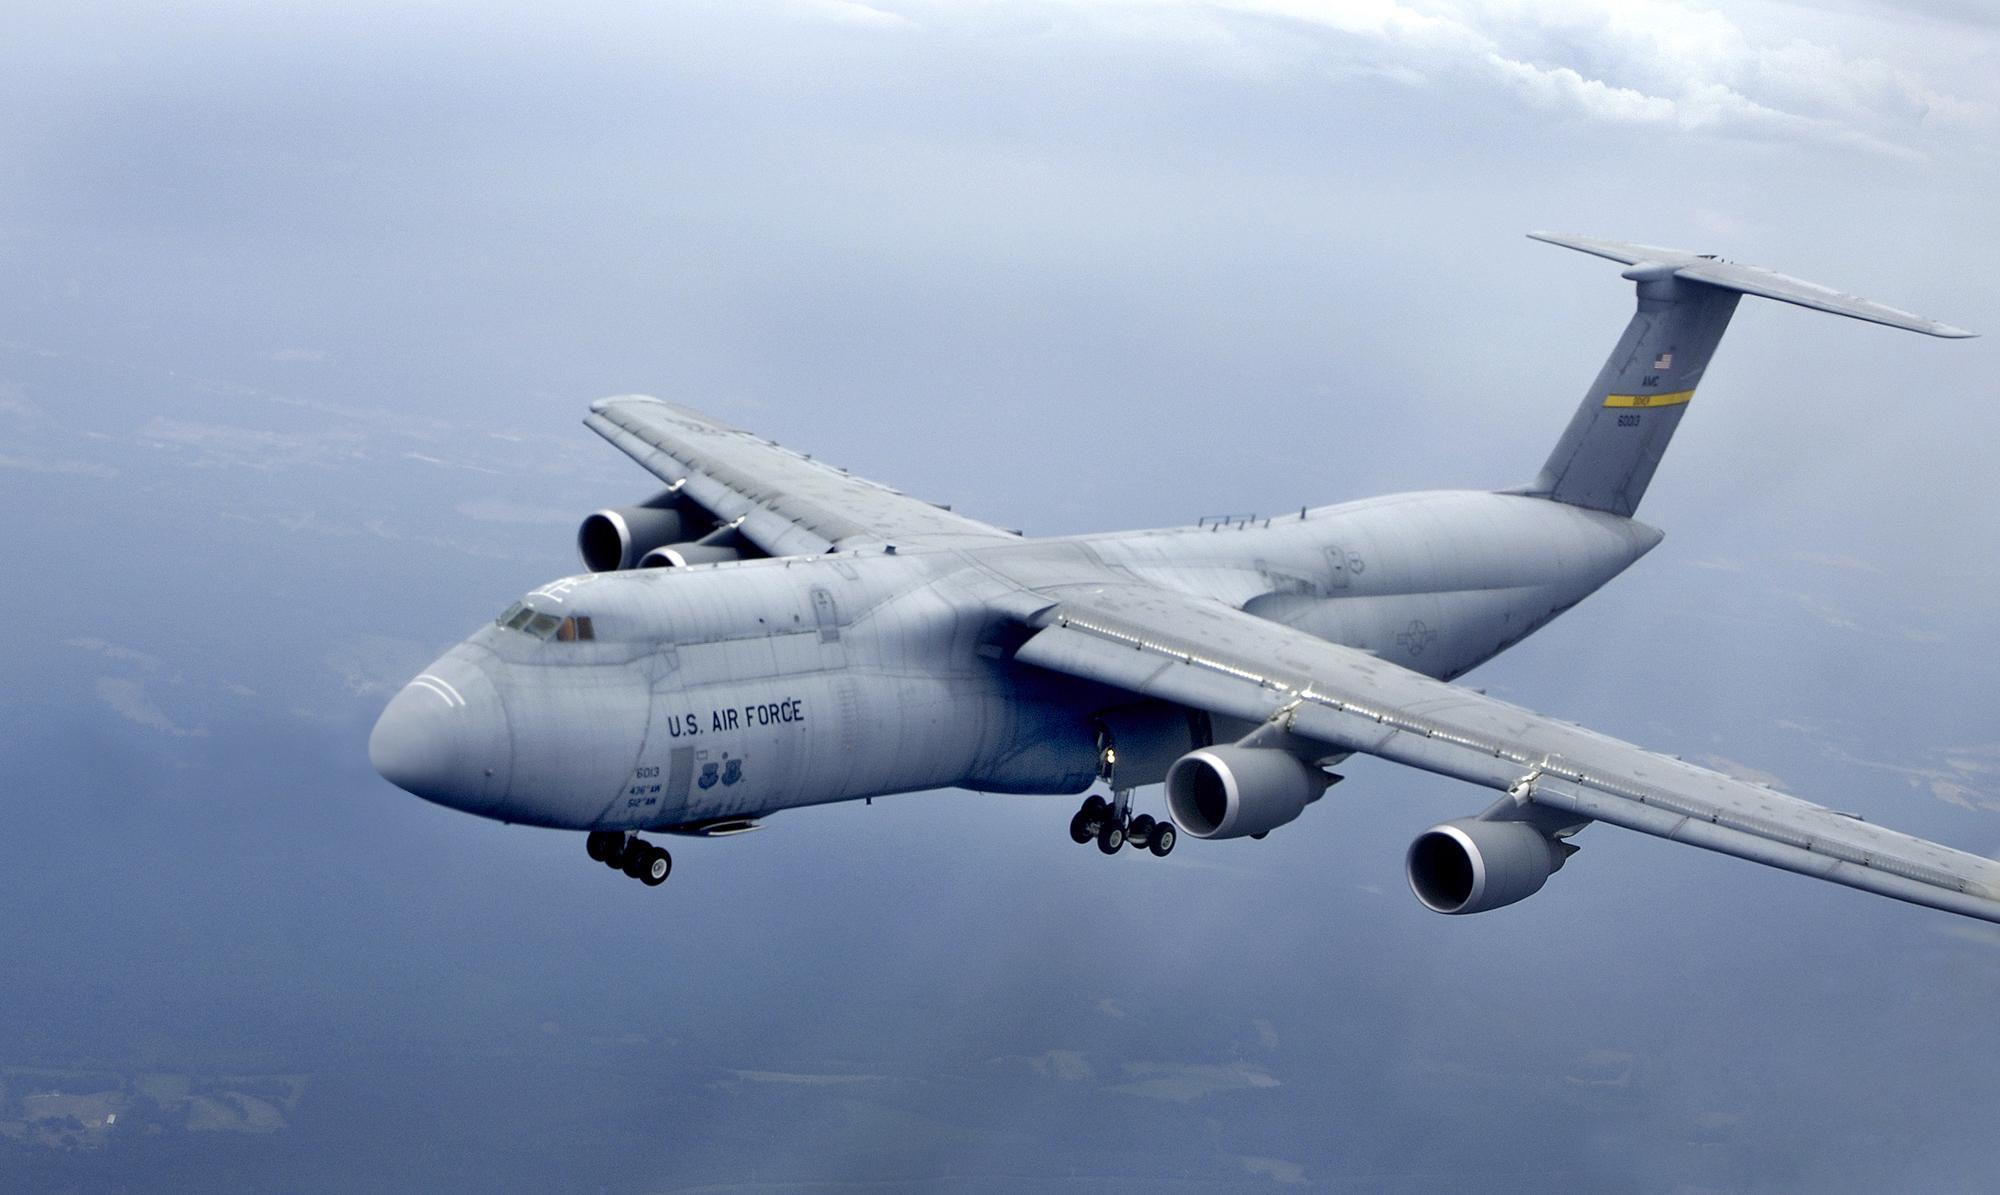 USAF Habiskan USD 10.000 untuk 1 Unit Penutup Toilet C-5 Galaxy